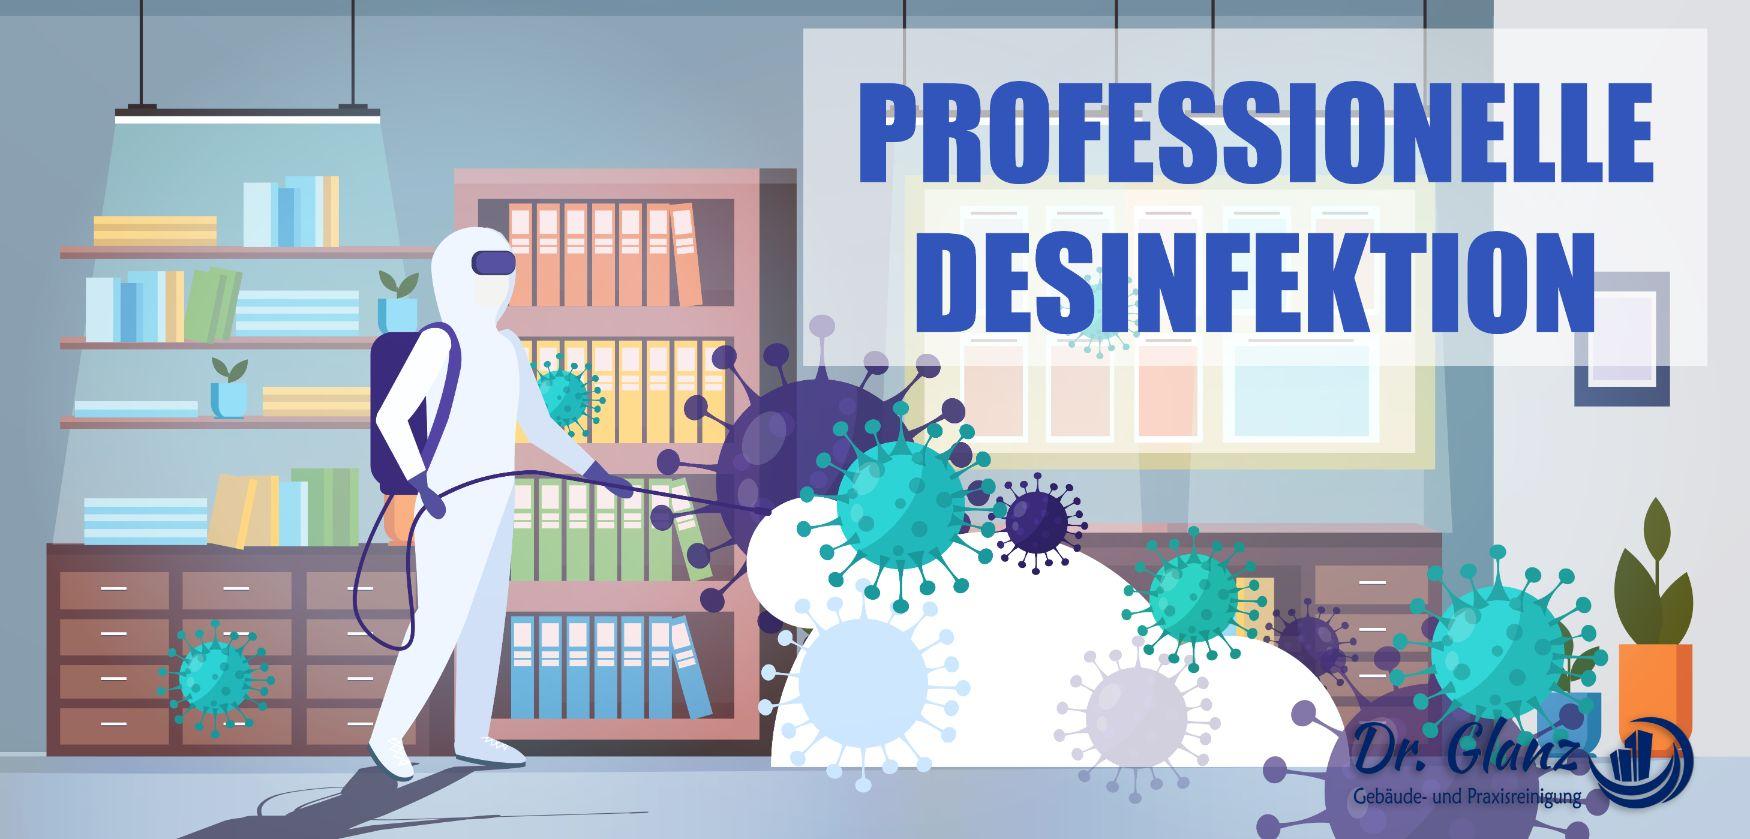 Professionelle Desinfektion